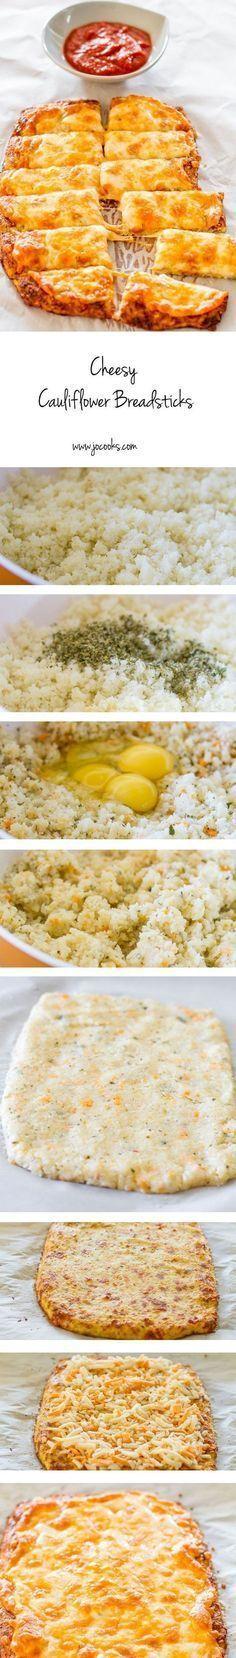 Cheesy Cauliflower Breadsticks – gluten free, low carb, cheesy cauliflower breadsticks! This recipe is a winner and a keeper!